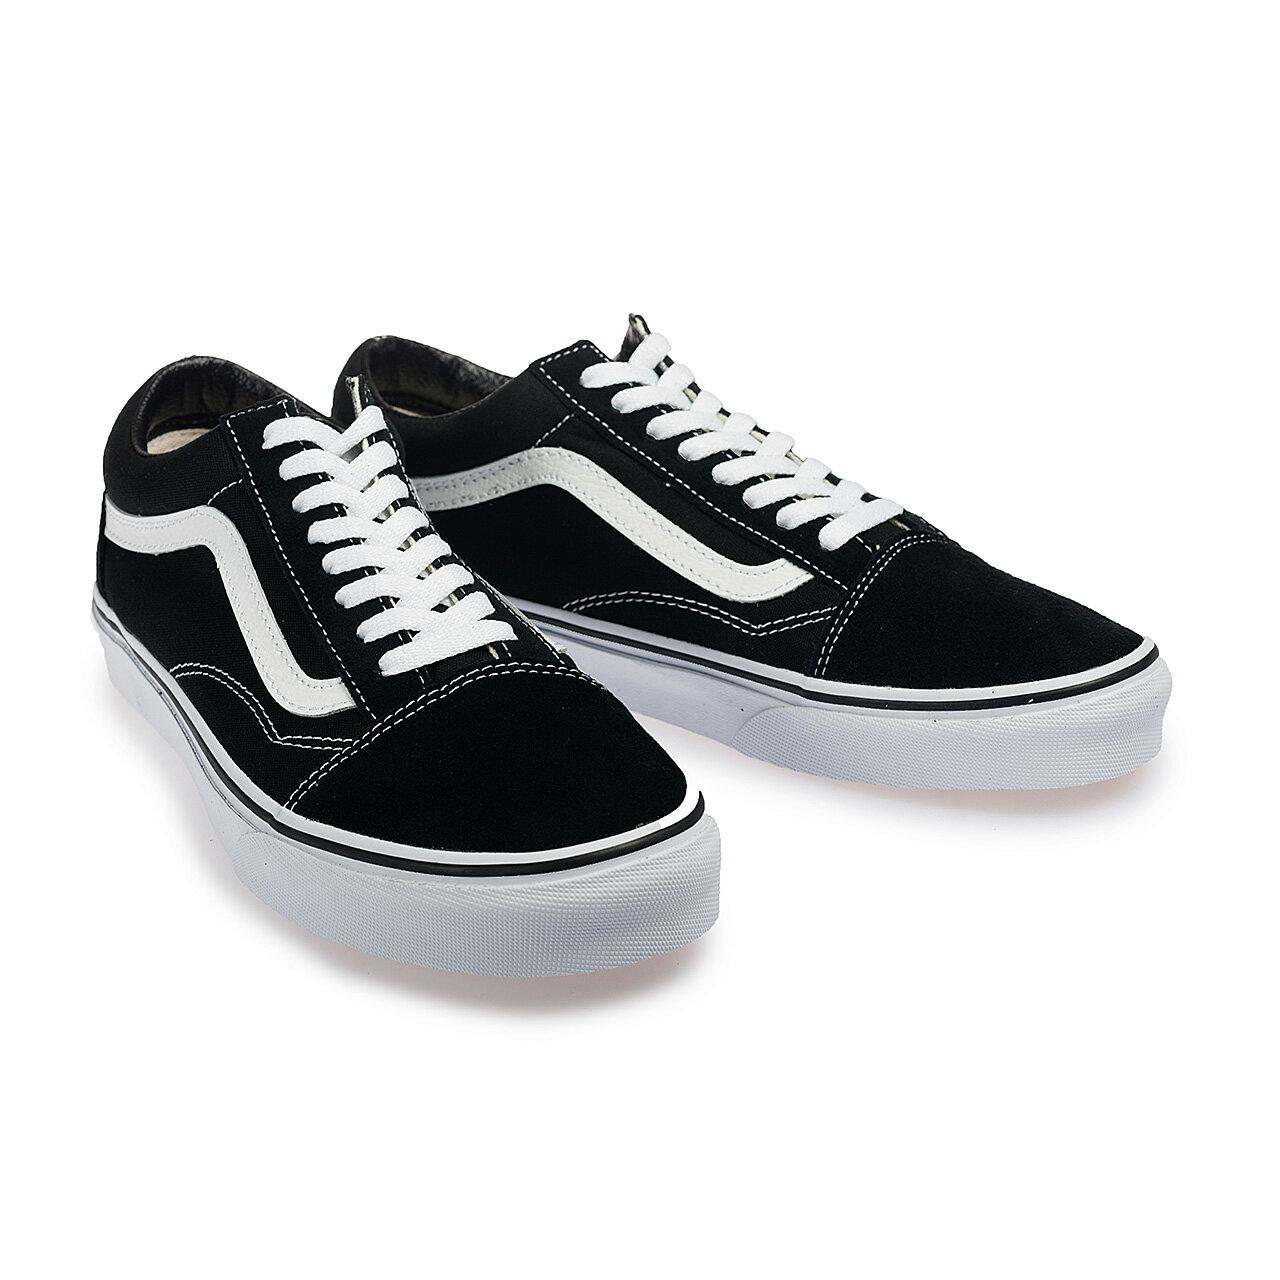 【VANS】 Old Skool 基本款  黑 經典款 休閒鞋 男女 專櫃價2380  VN000D3HY28(palace store) 1